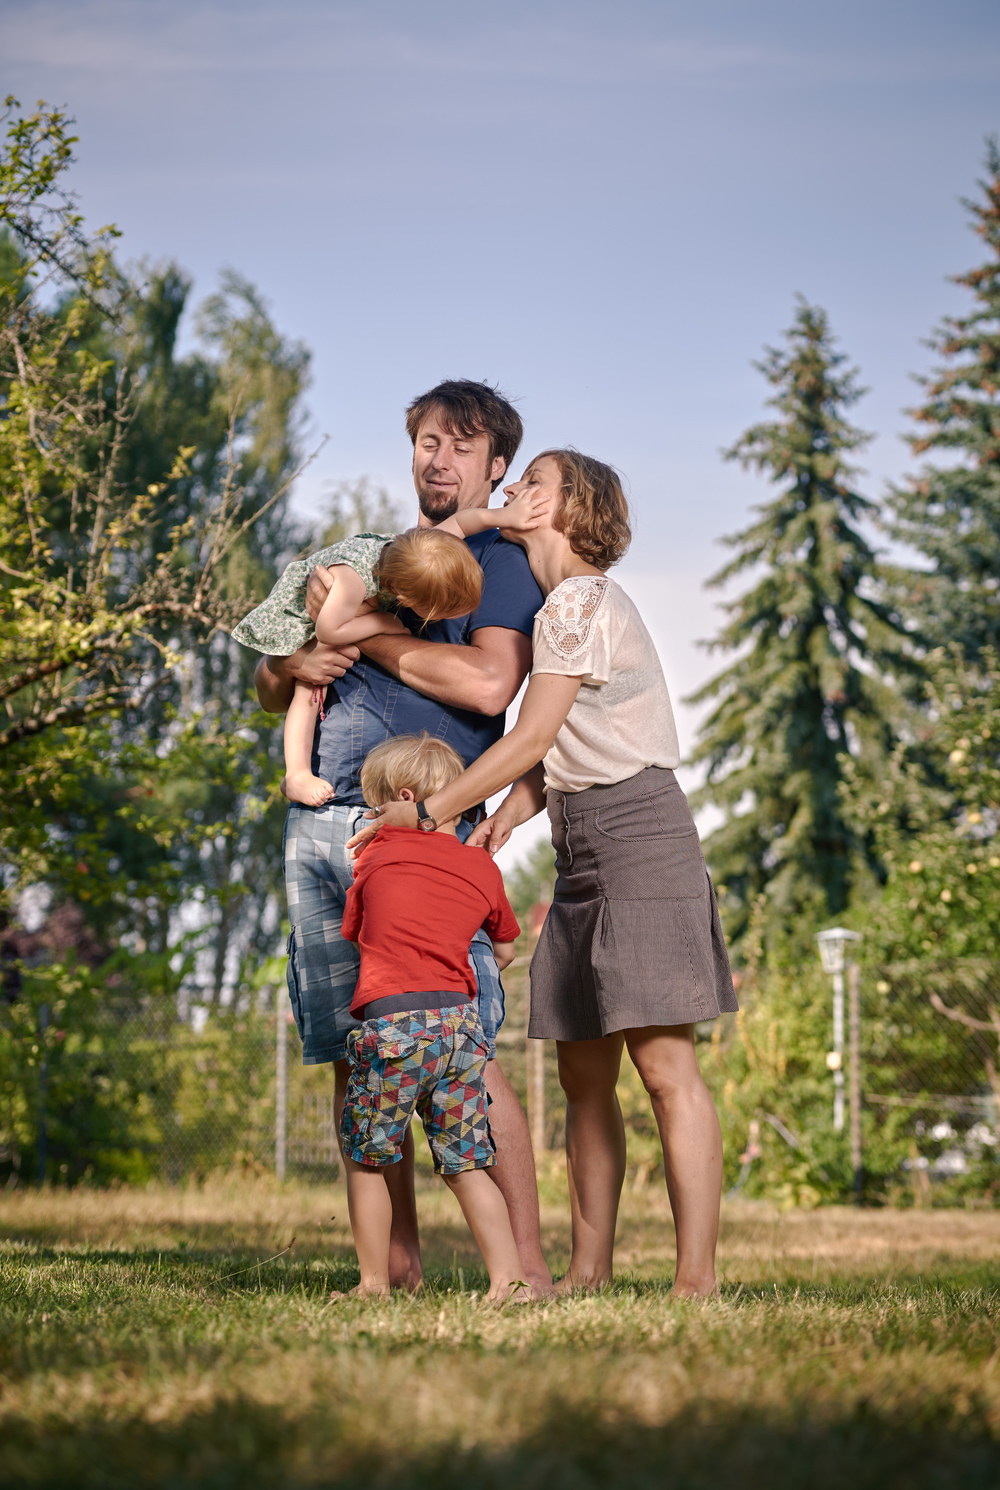 Familie 1 © NILS BORNEMANN.jpg